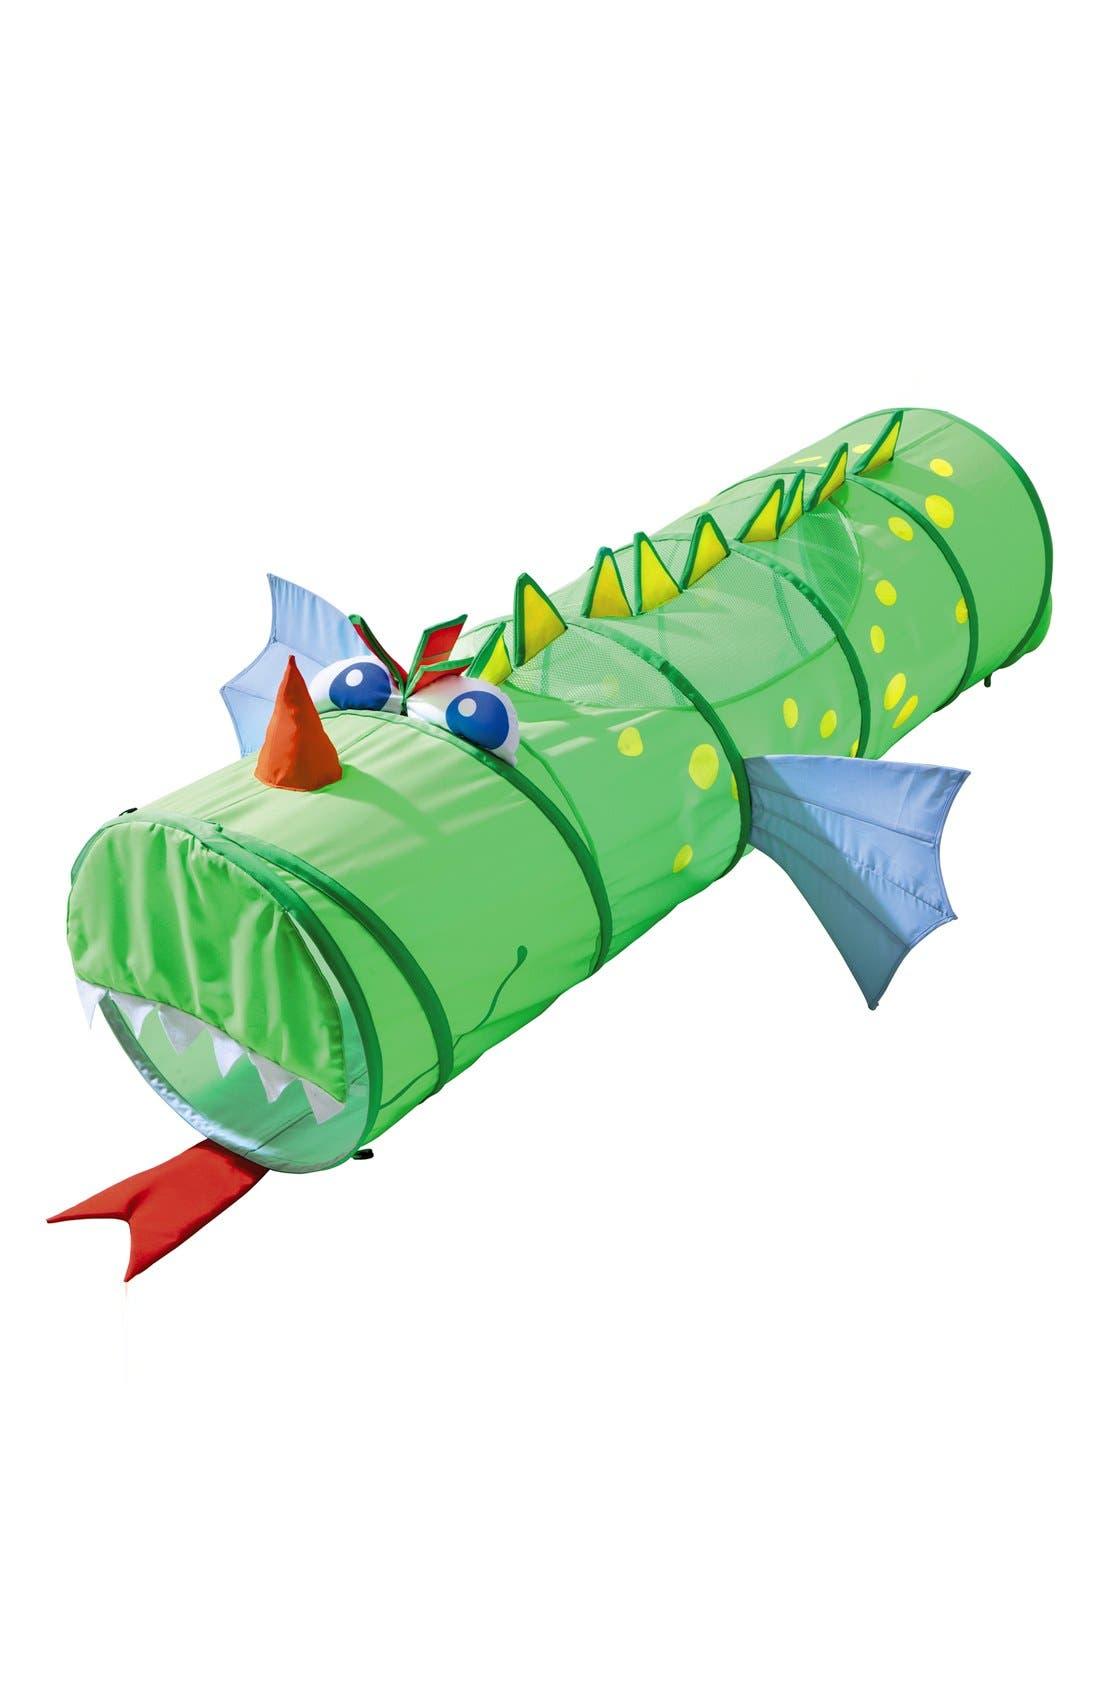 Alternate Image 1 Selected - HABA 'Croco Kuno' Dragon Crawling Tunnel